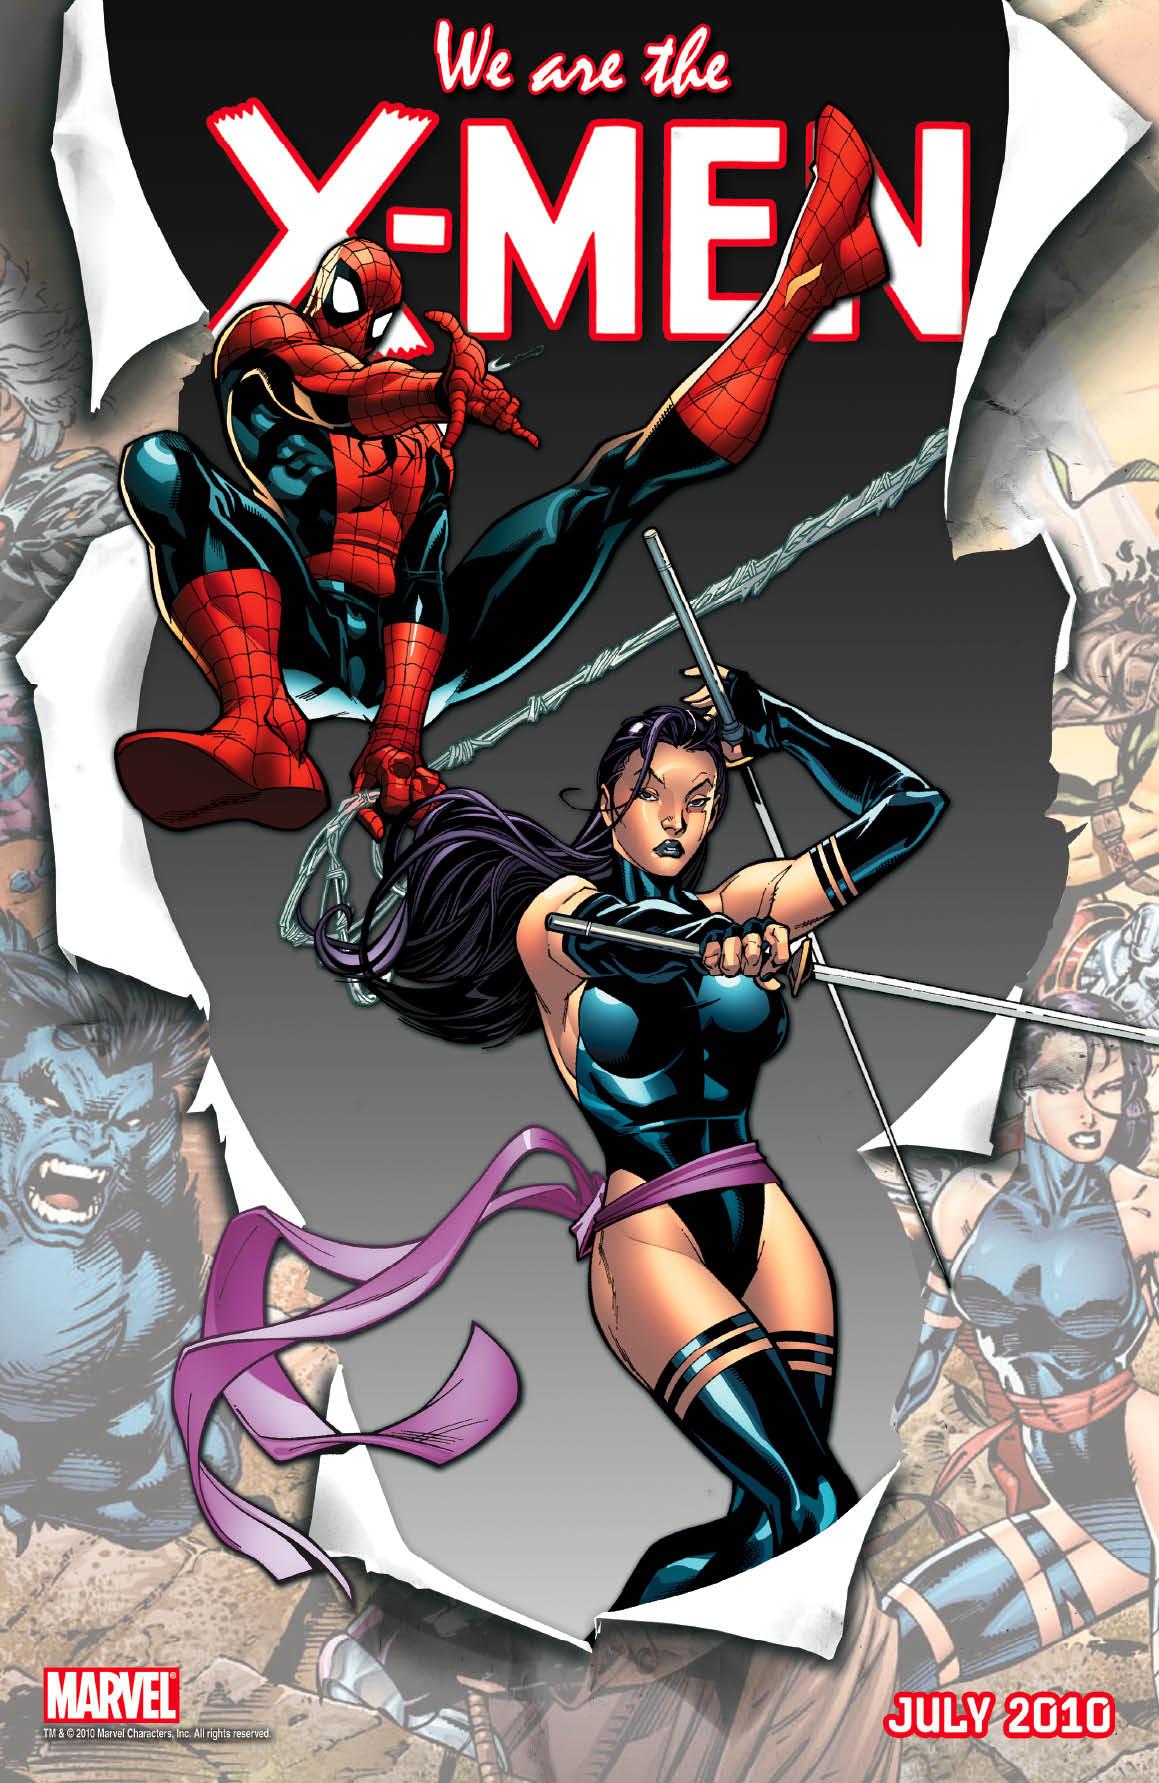 WeAreTheX-Men_01 They Are The X-Men